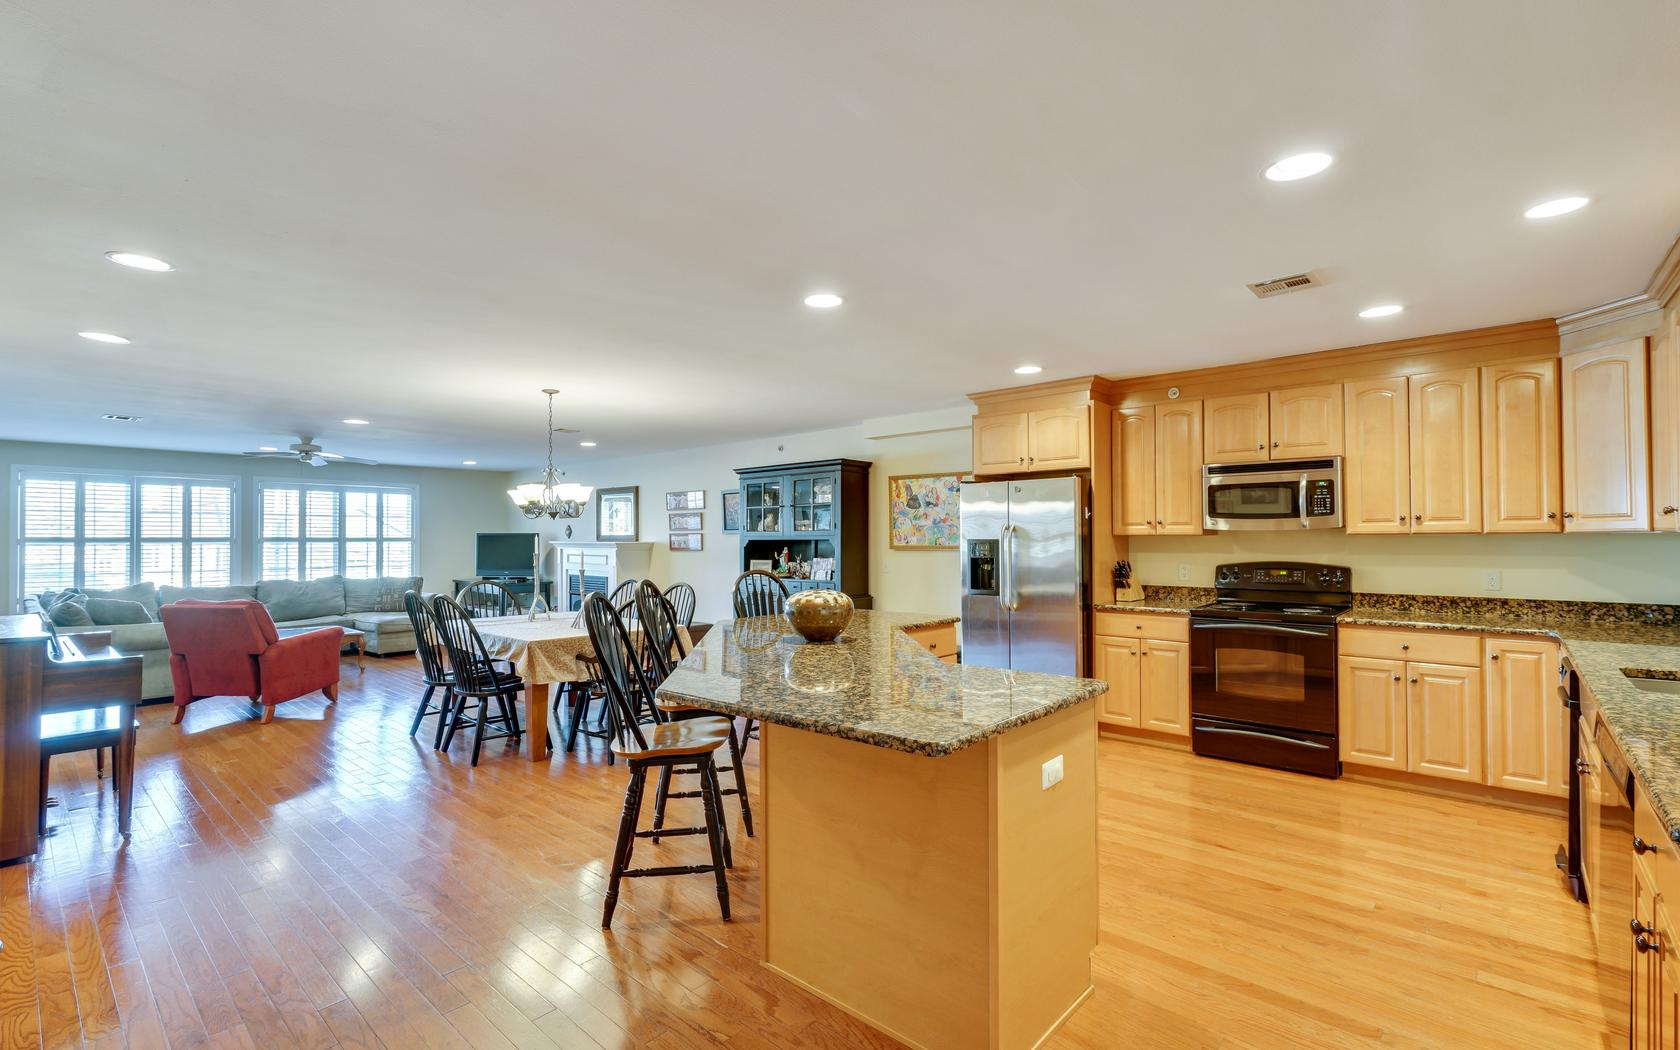 Condominium for Sale at Spacious Beach Condo 580 Main St E, 4 Manasquan, New Jersey 08736 United States